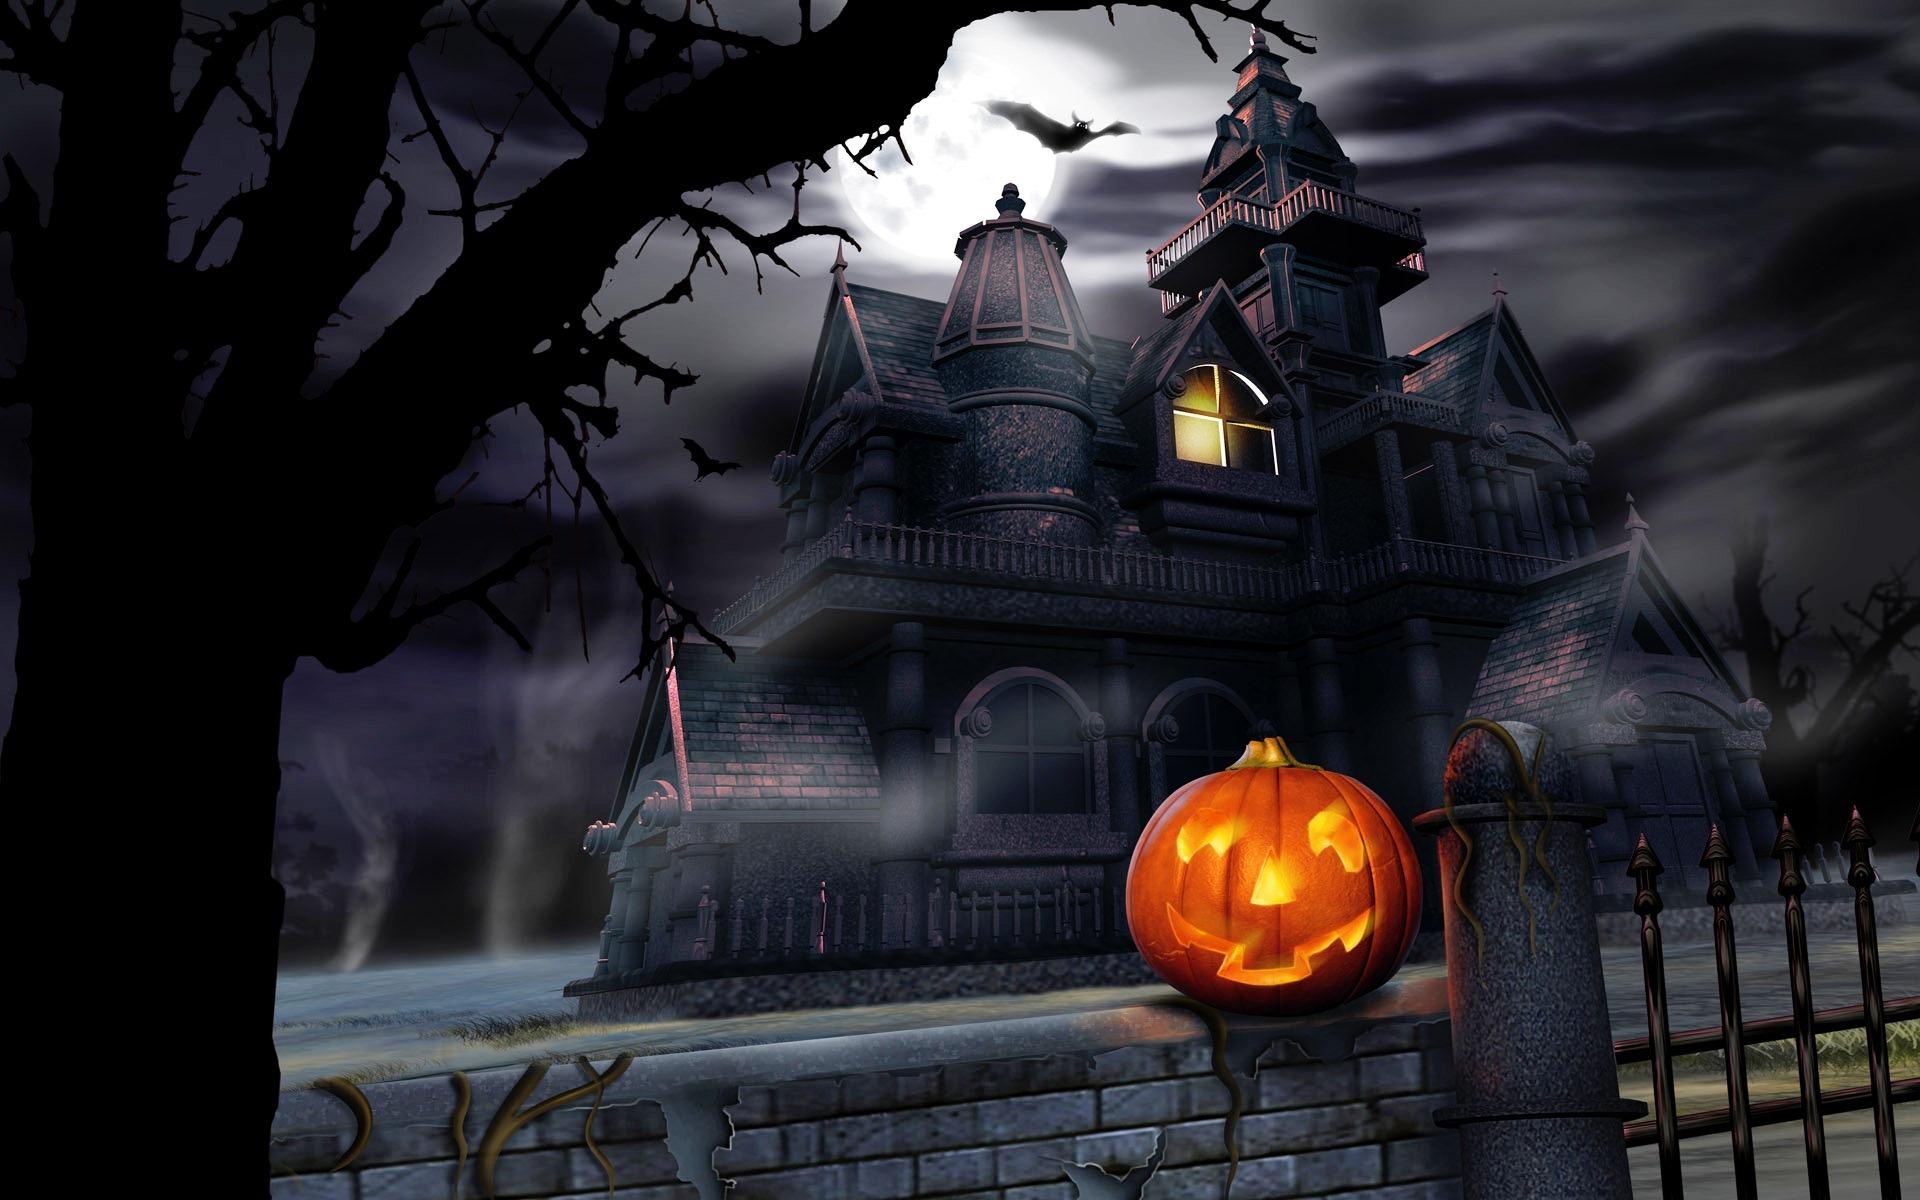 halloween desktop backgrounds for kids With Resolutions 19201200 1920x1200